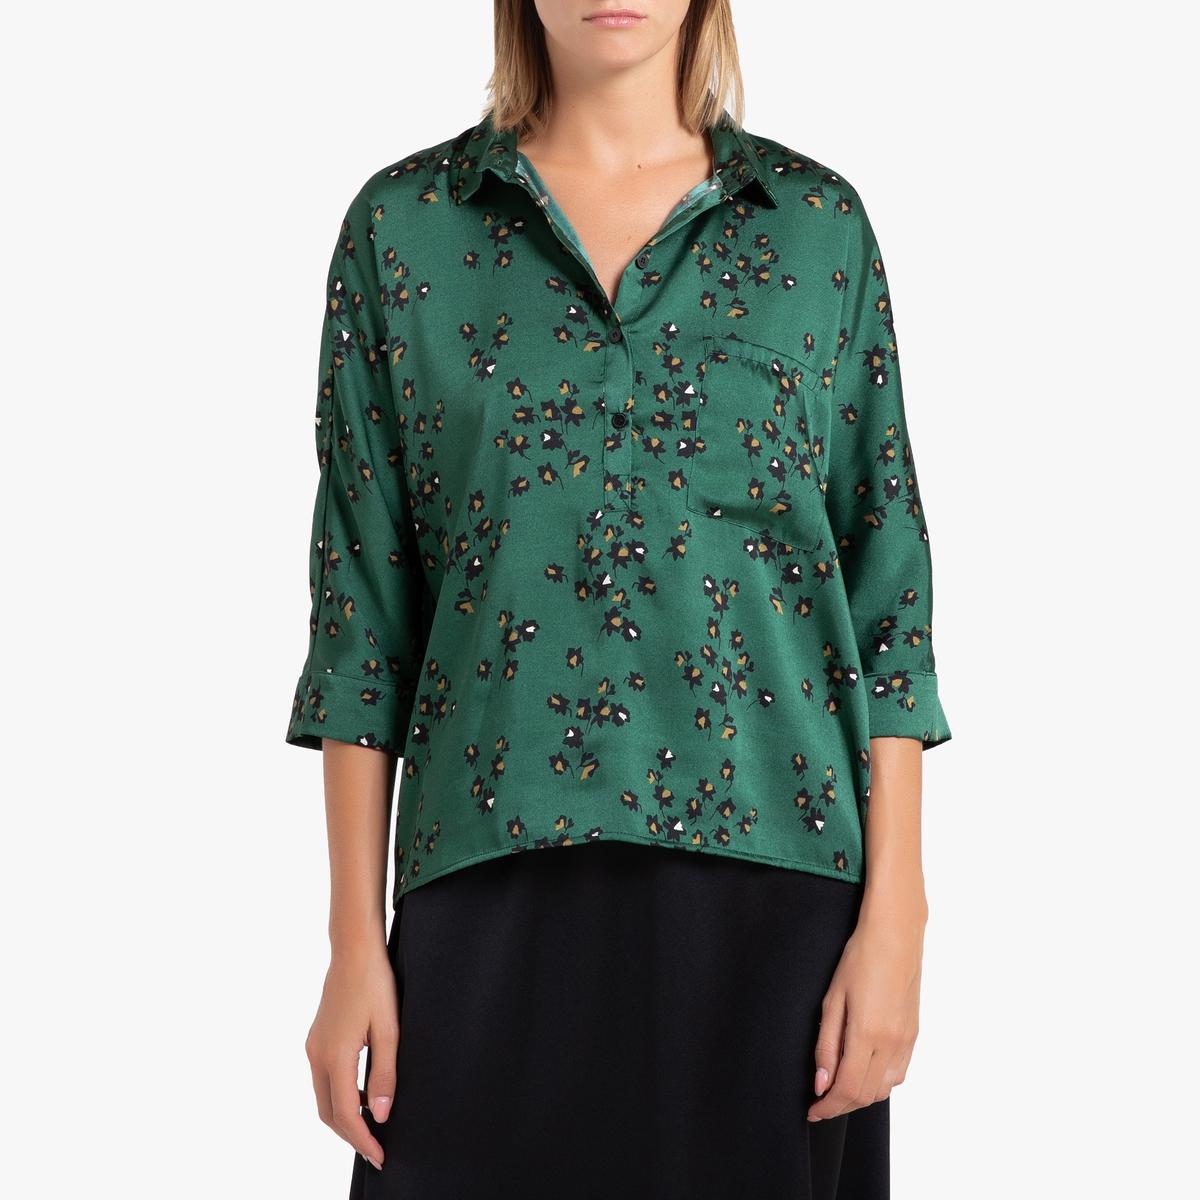 Блузка La Redoute С рисунком и рукавами VICTORI XL зеленый блузка с рисунком и рукавами с напуском kalao blouse